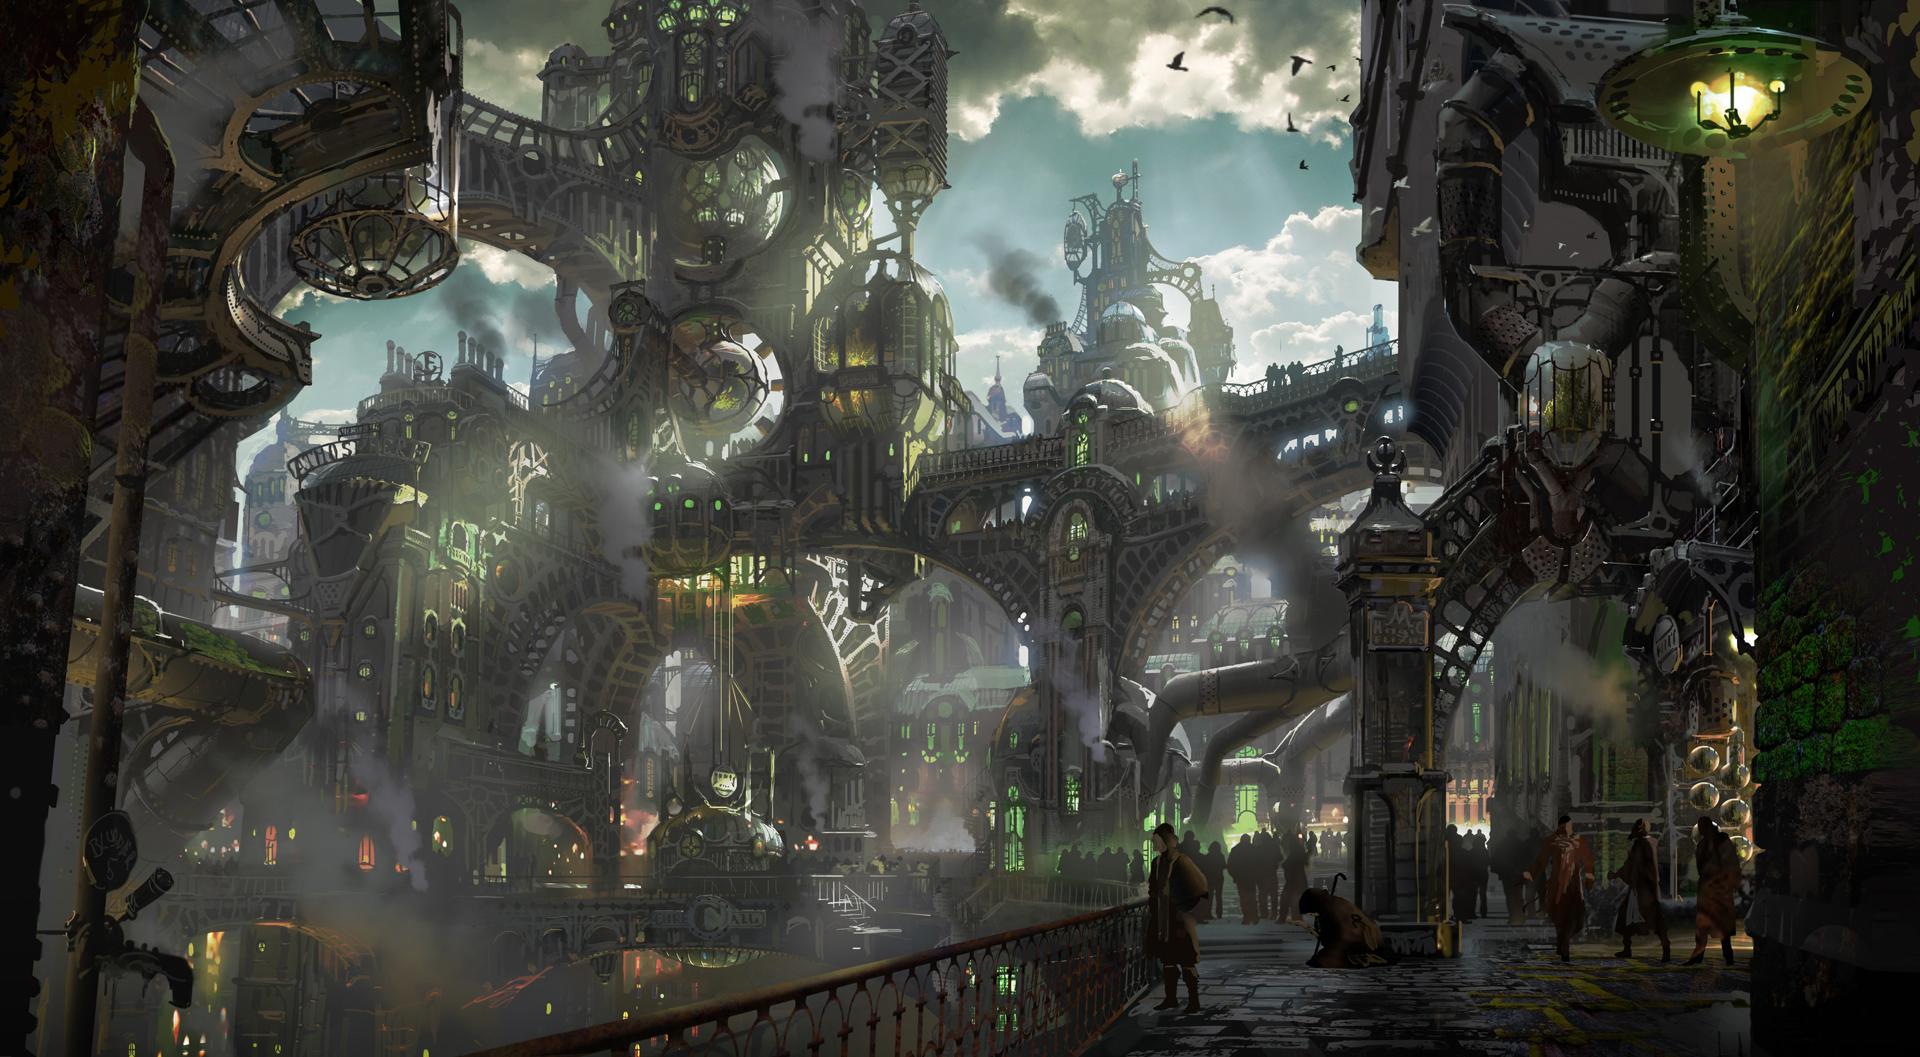 Pin By Peter Burroughs On League Of Legends Environment Art Steampunk City League Of Legends Fantasy Landscape